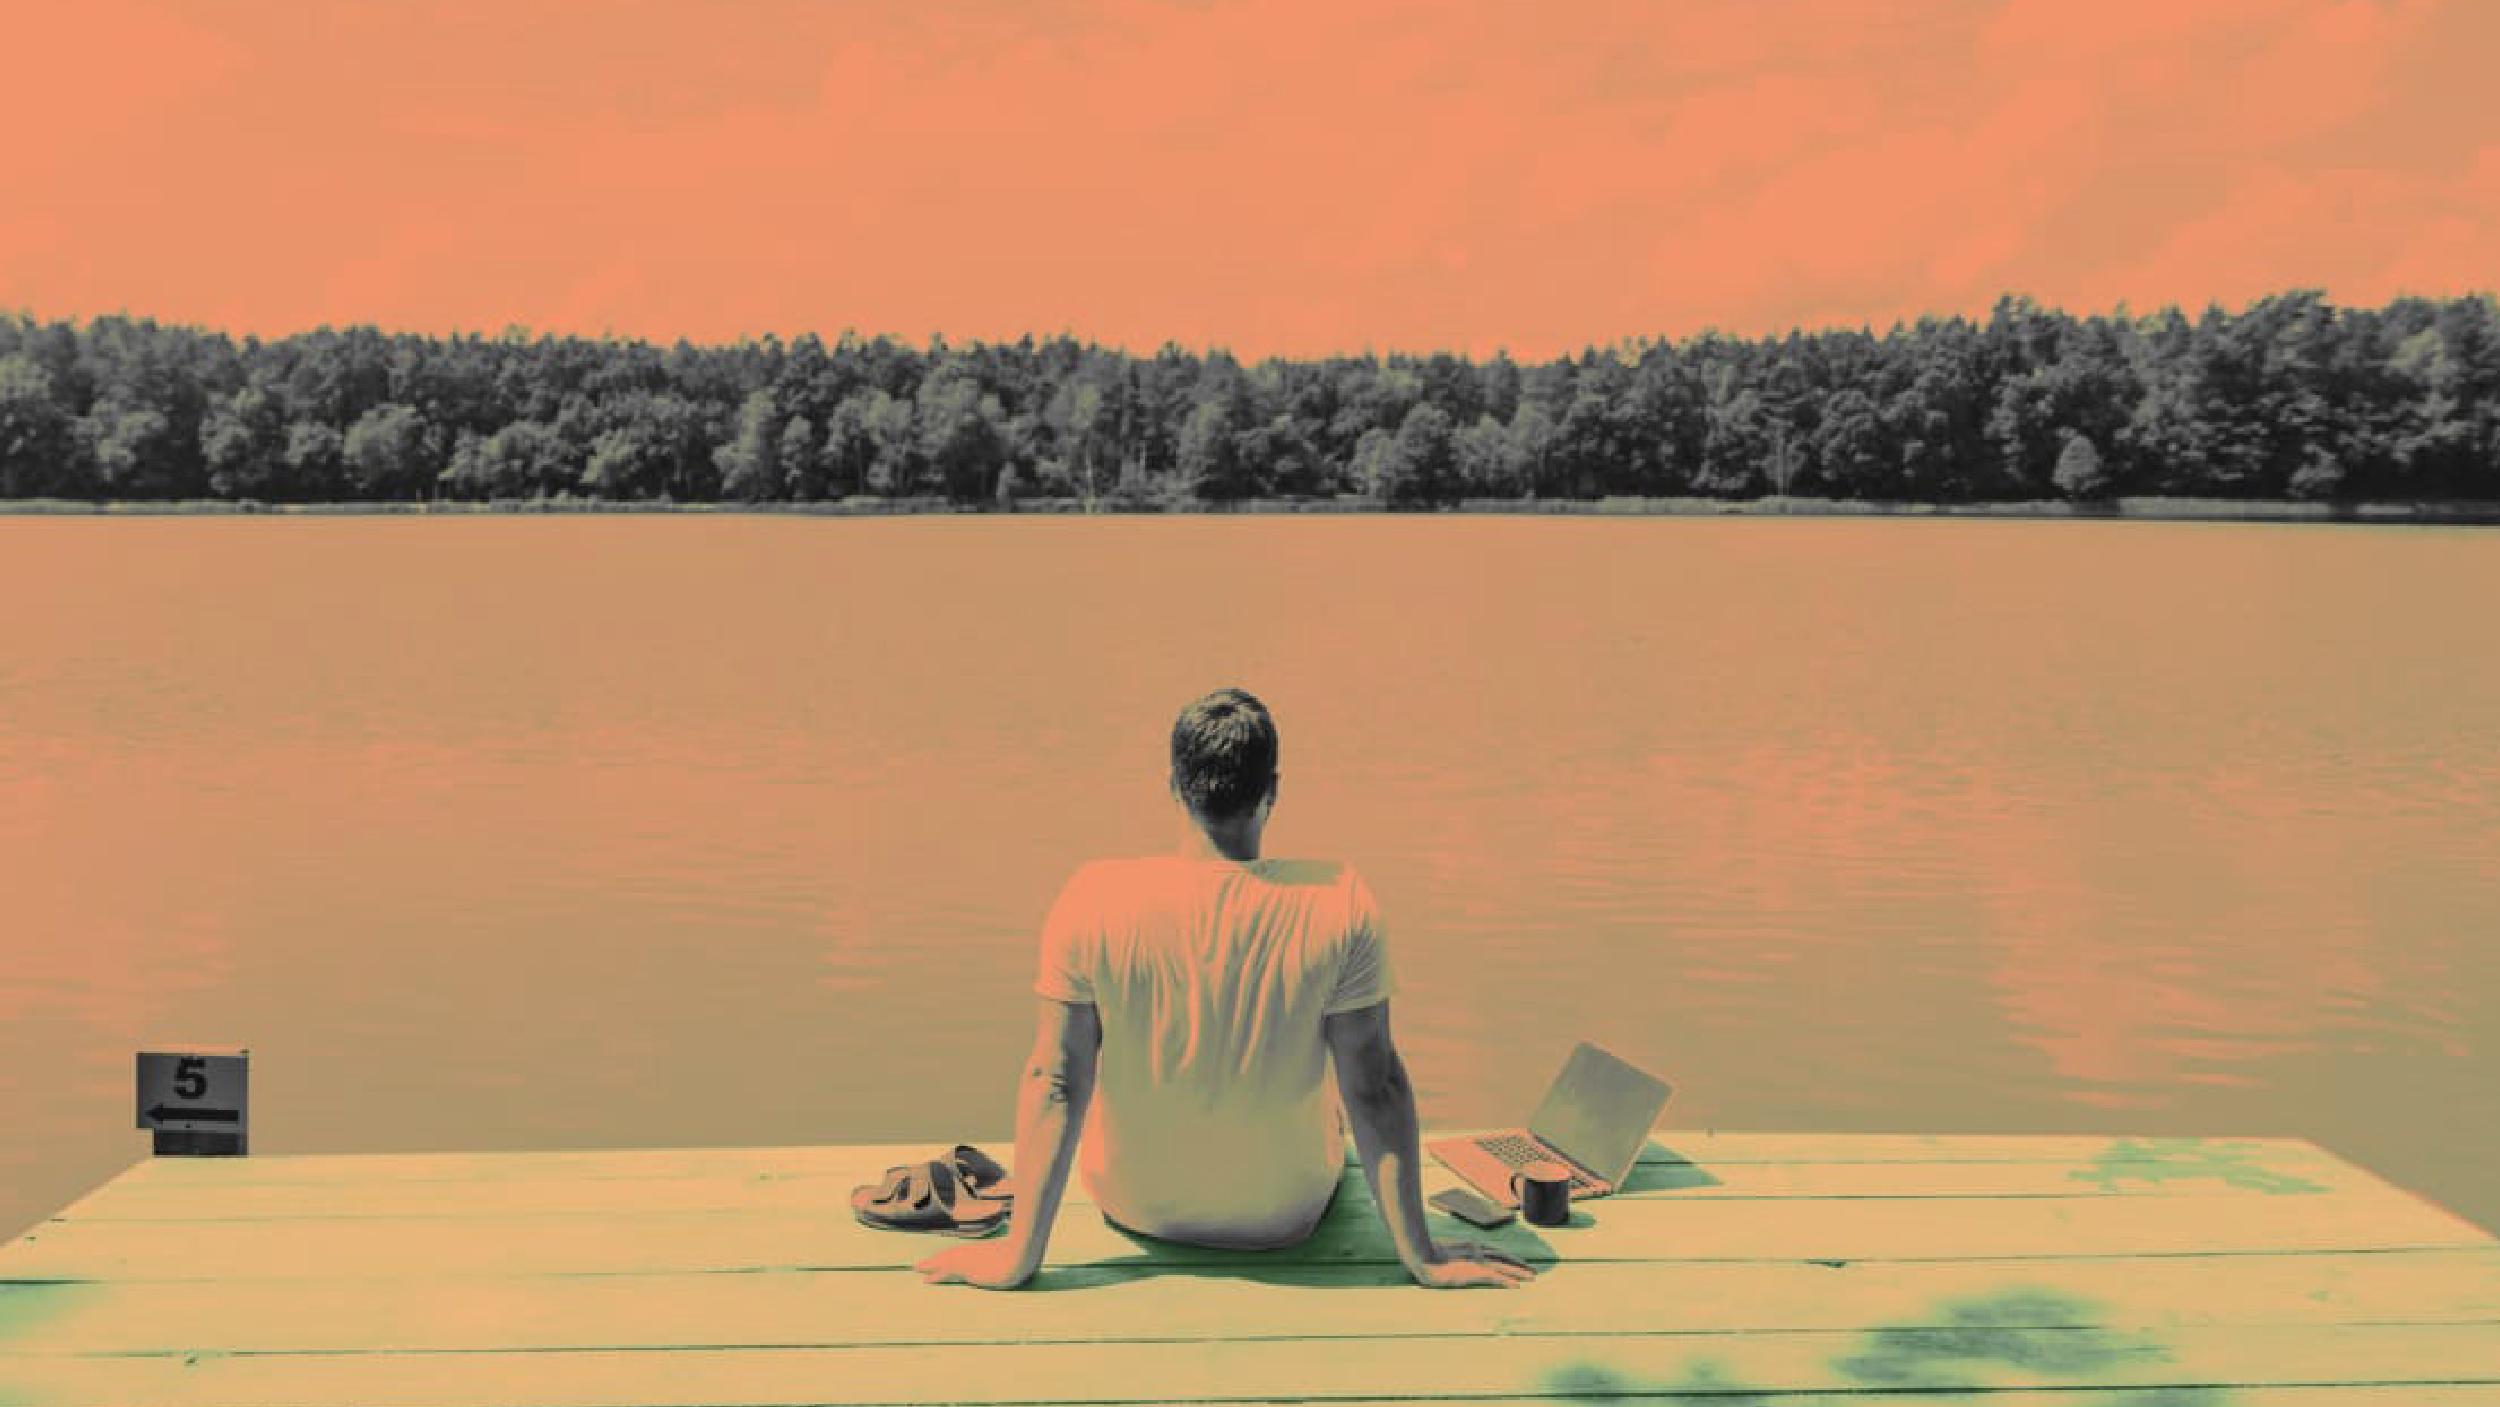 Man sitting on a dock facing a lake